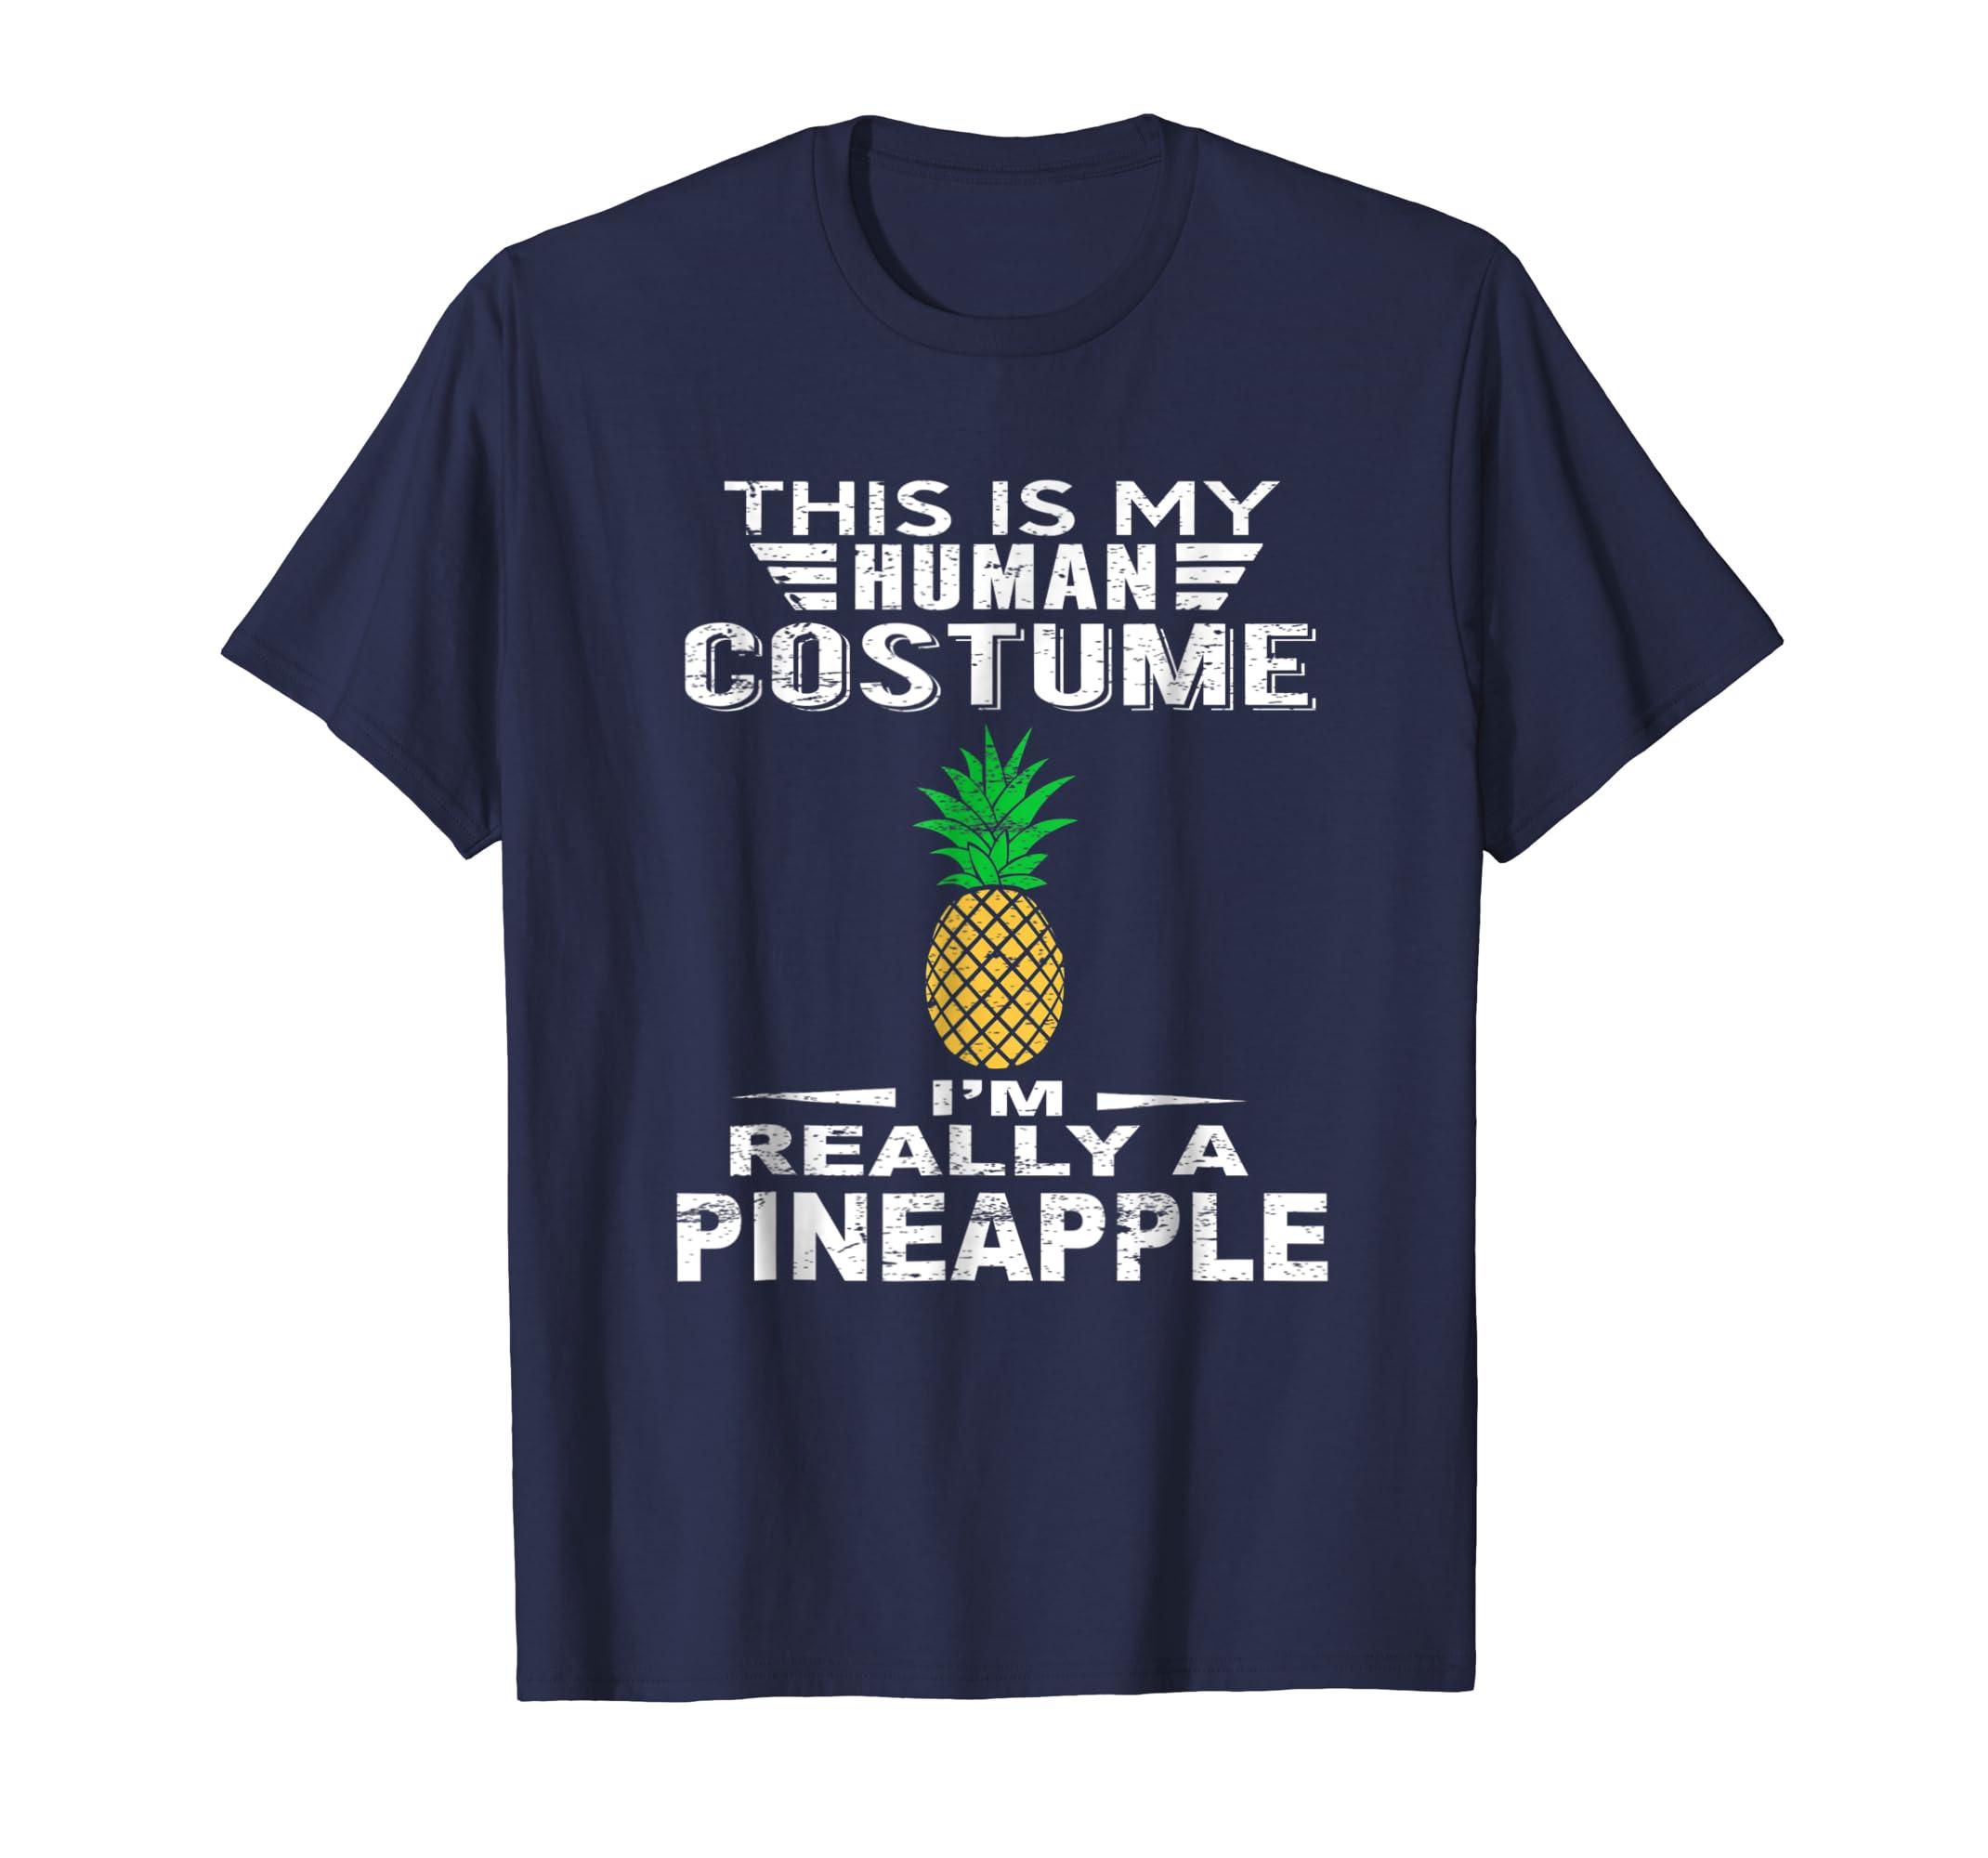 Super Halloween Costume Pineapple Tshirt Heart Kids Adults-ANZ